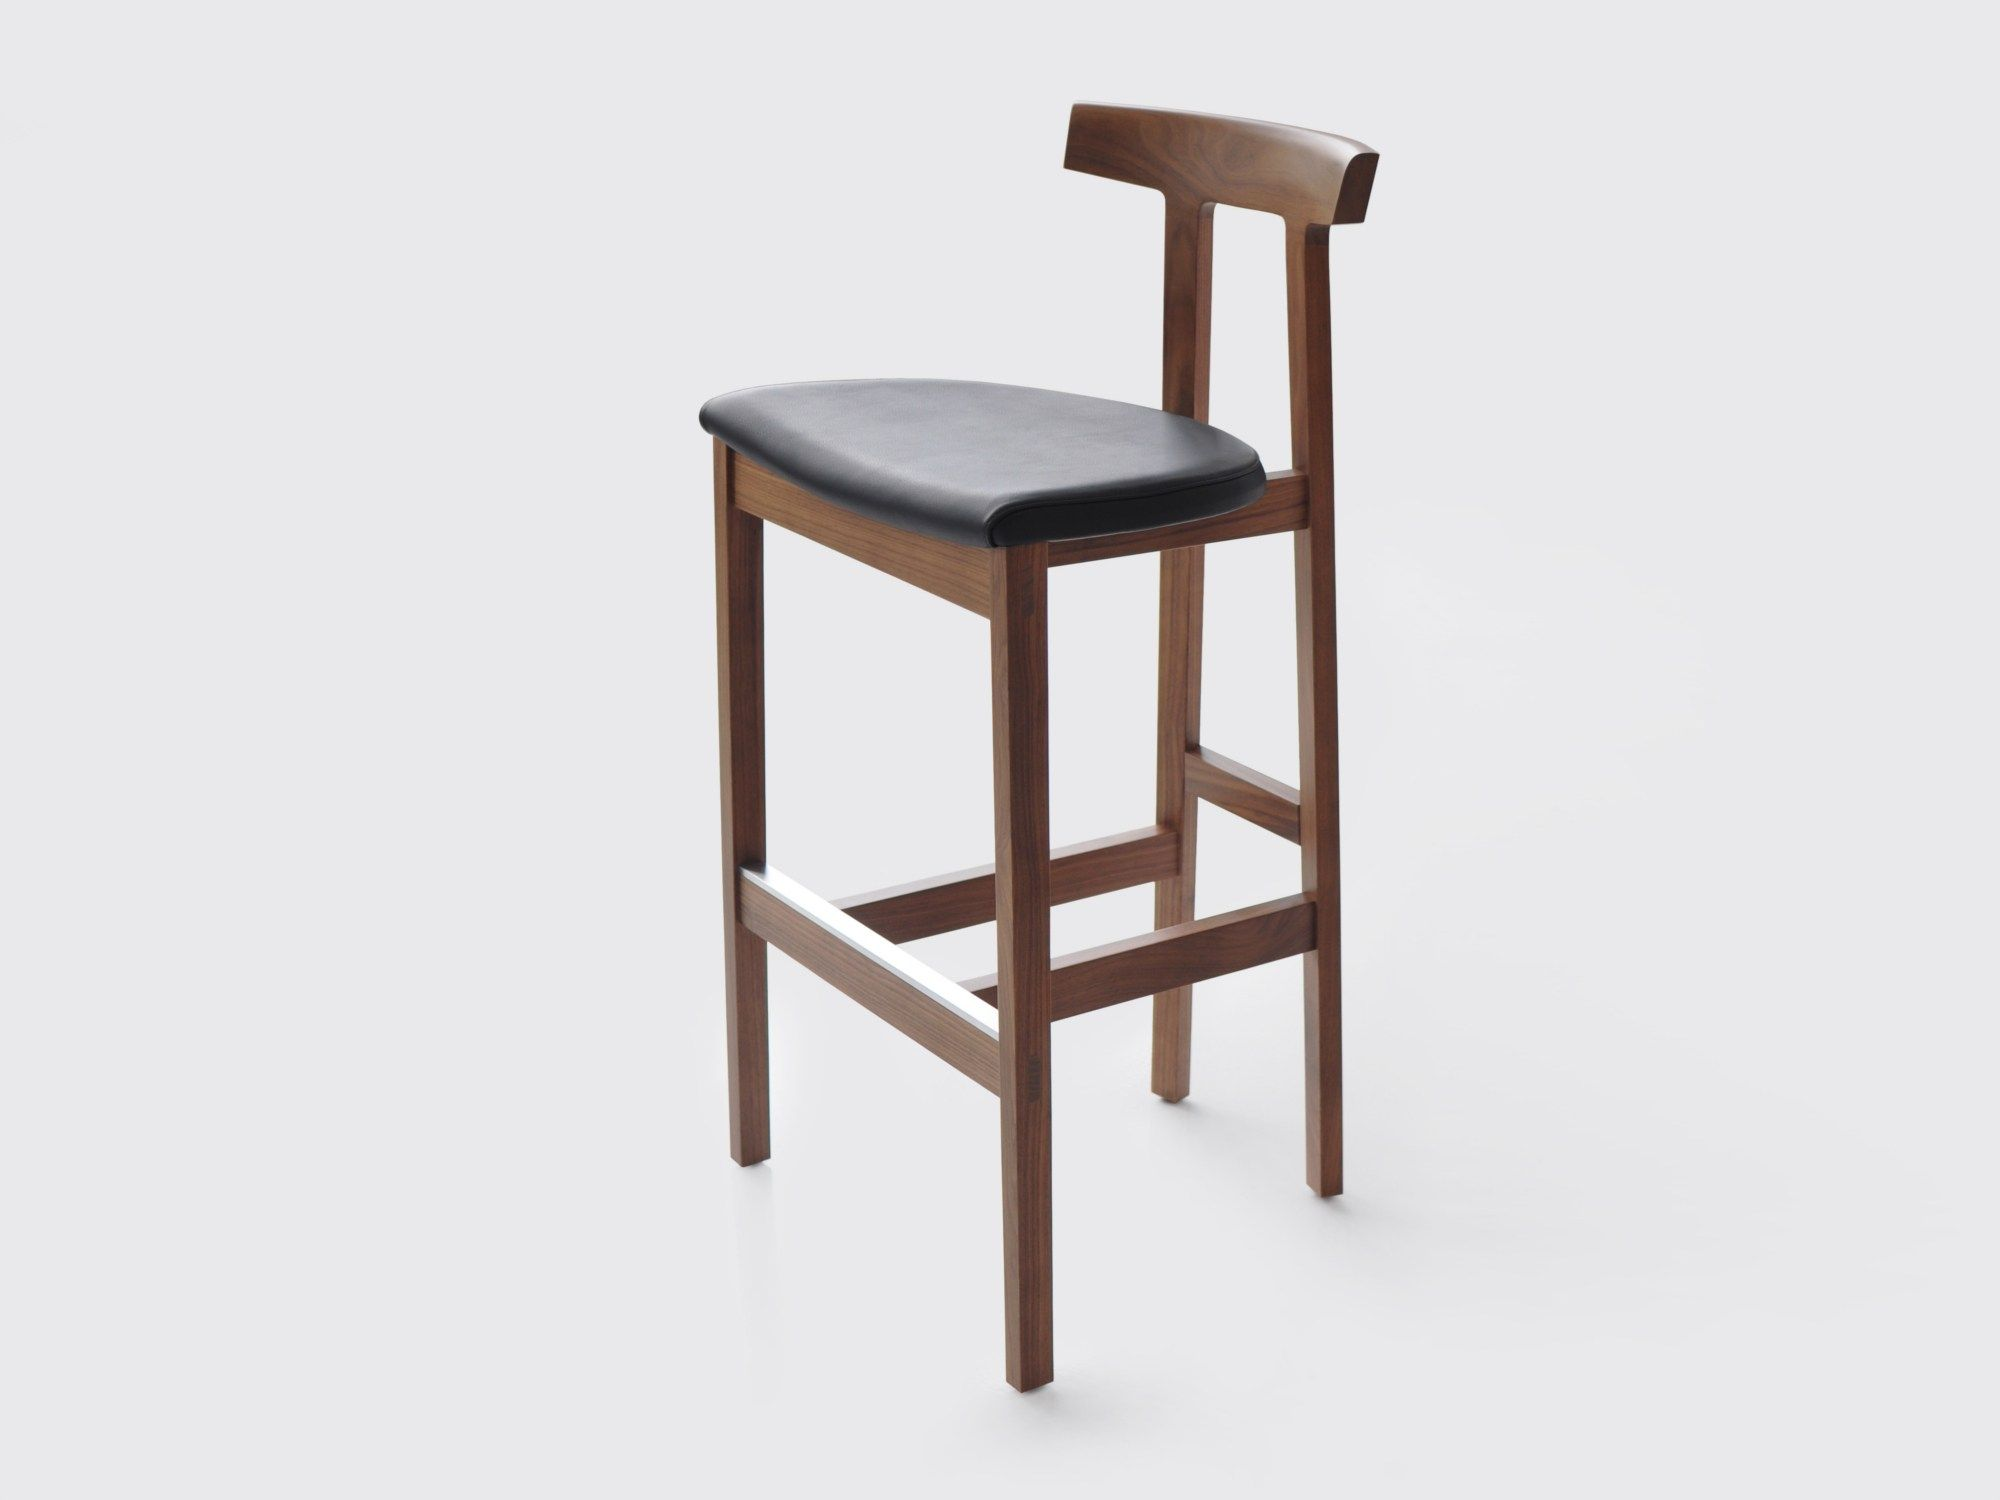 Torii bar sgabello collezione torii by bensen in 2019 sedie